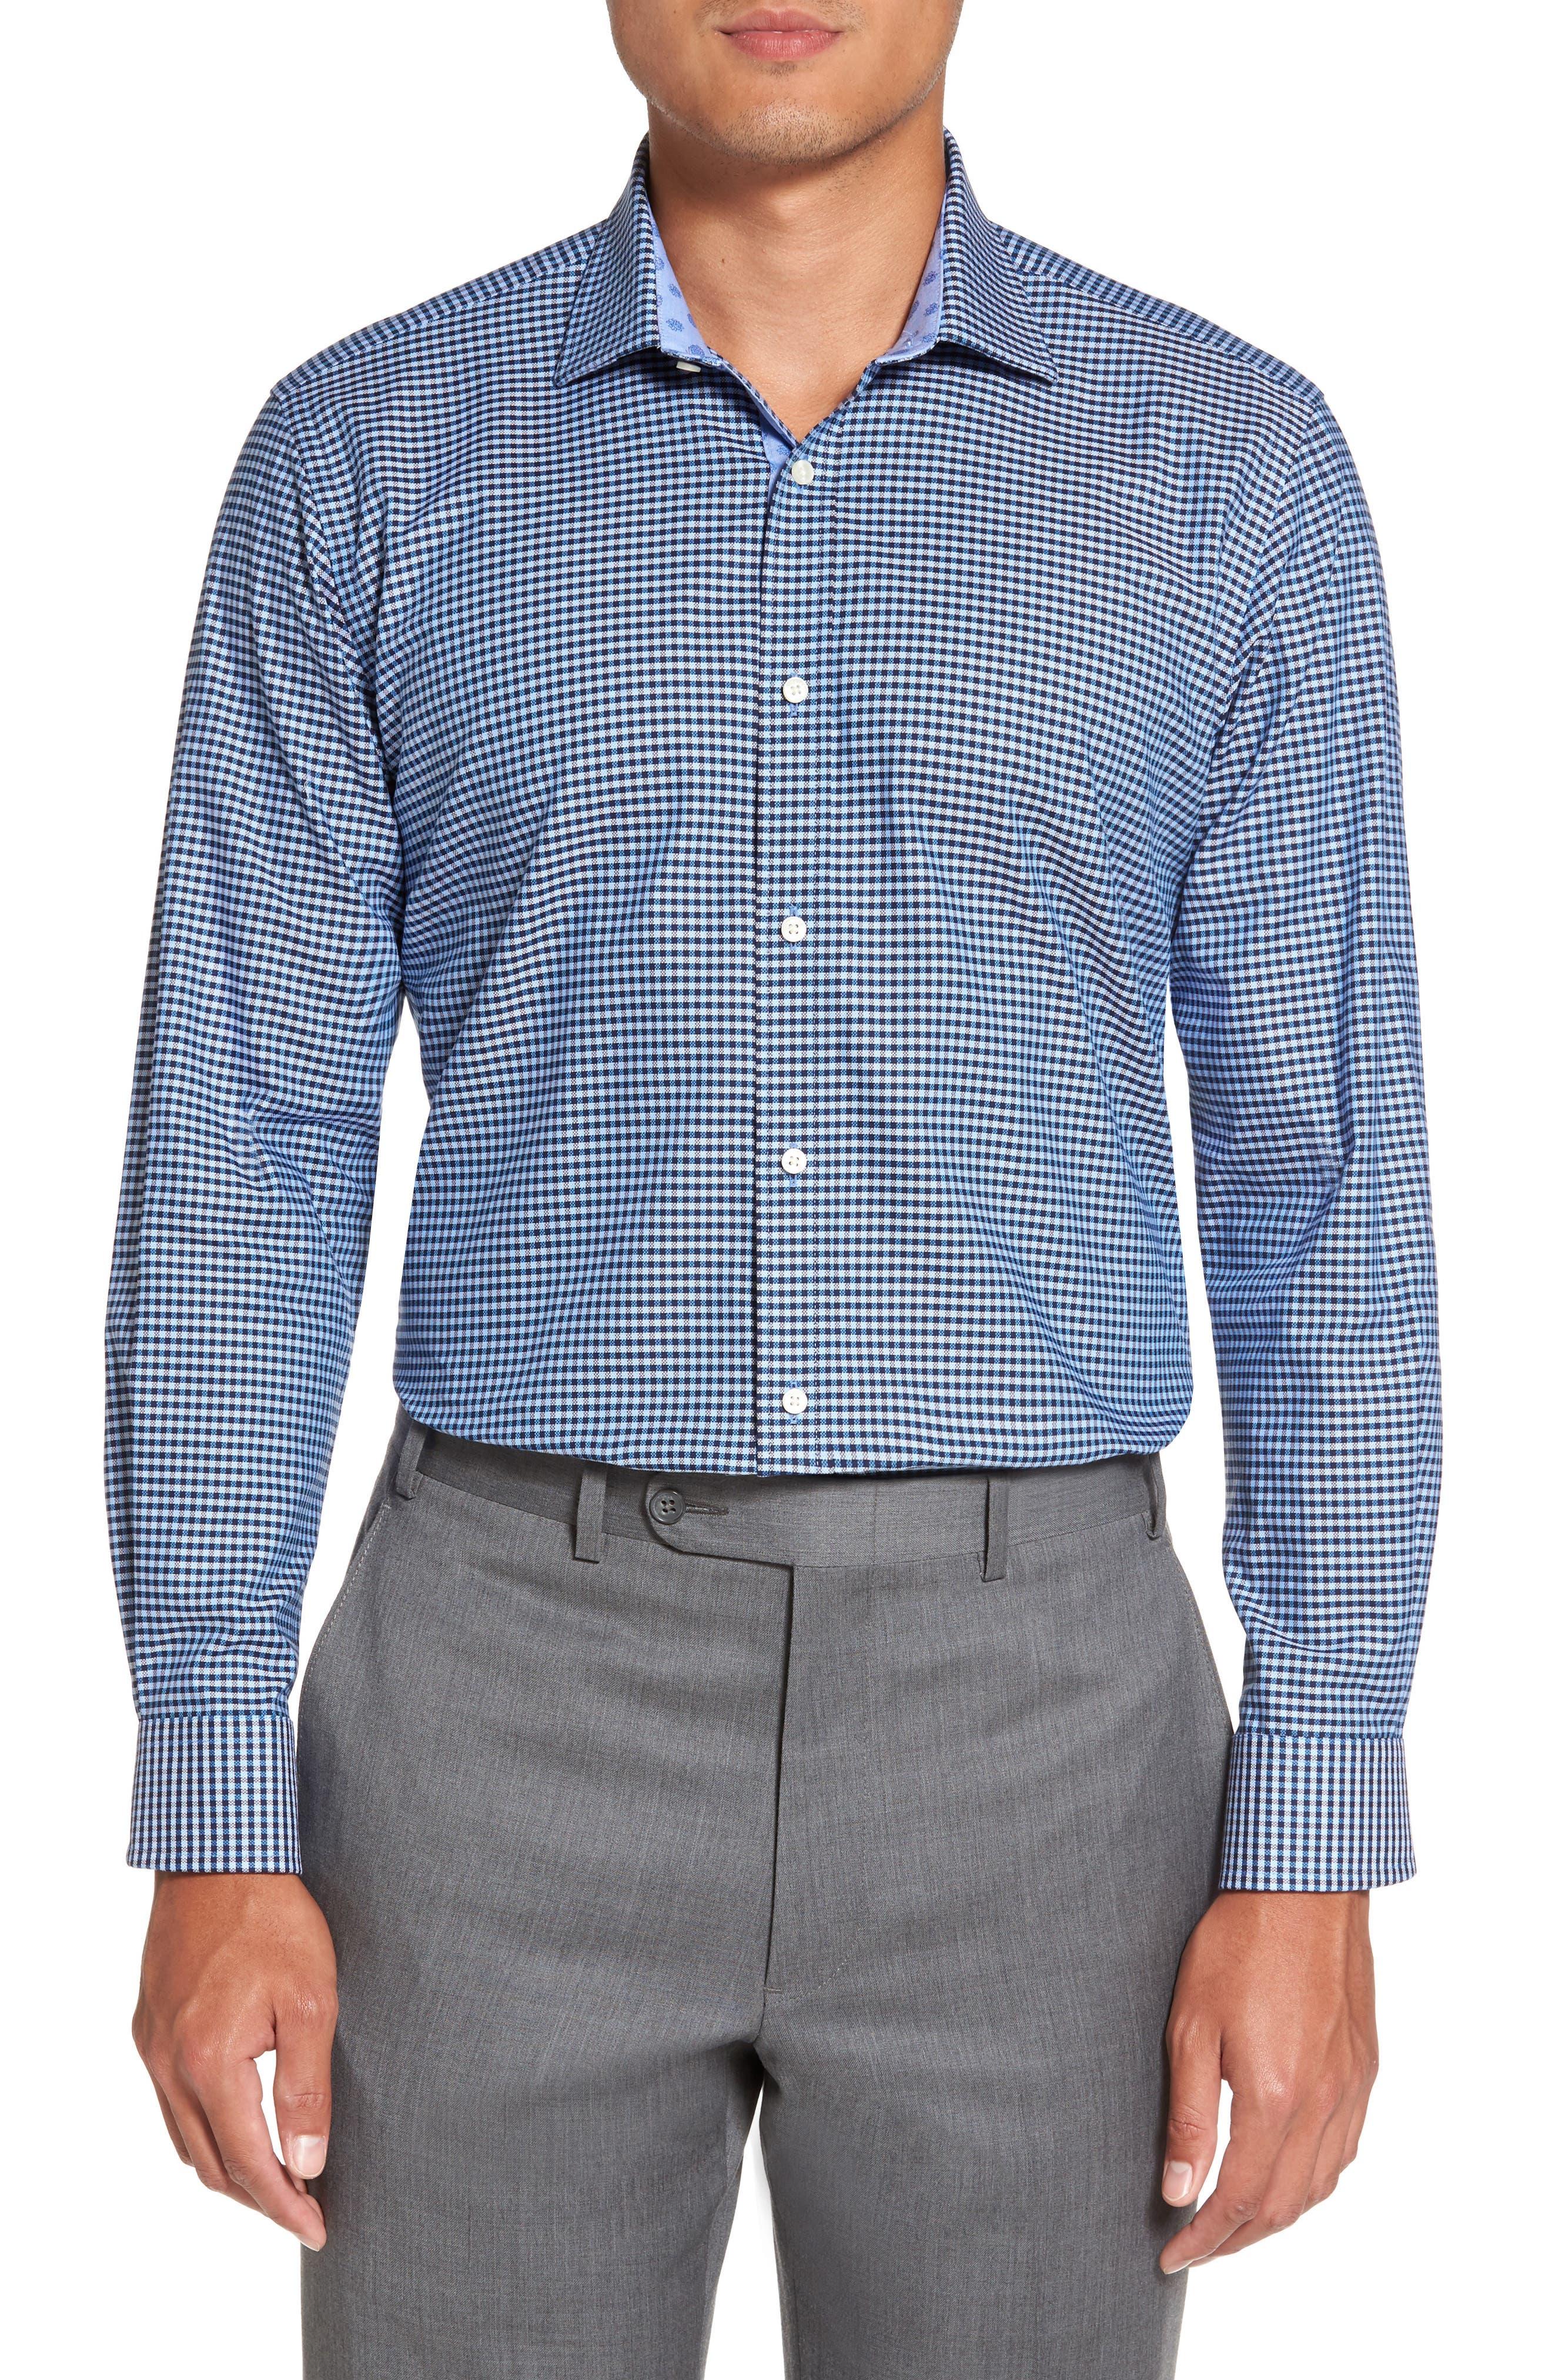 Endurance Sterling Trim Fit Dress Shirt,                             Alternate thumbnail 2, color,                             Blue